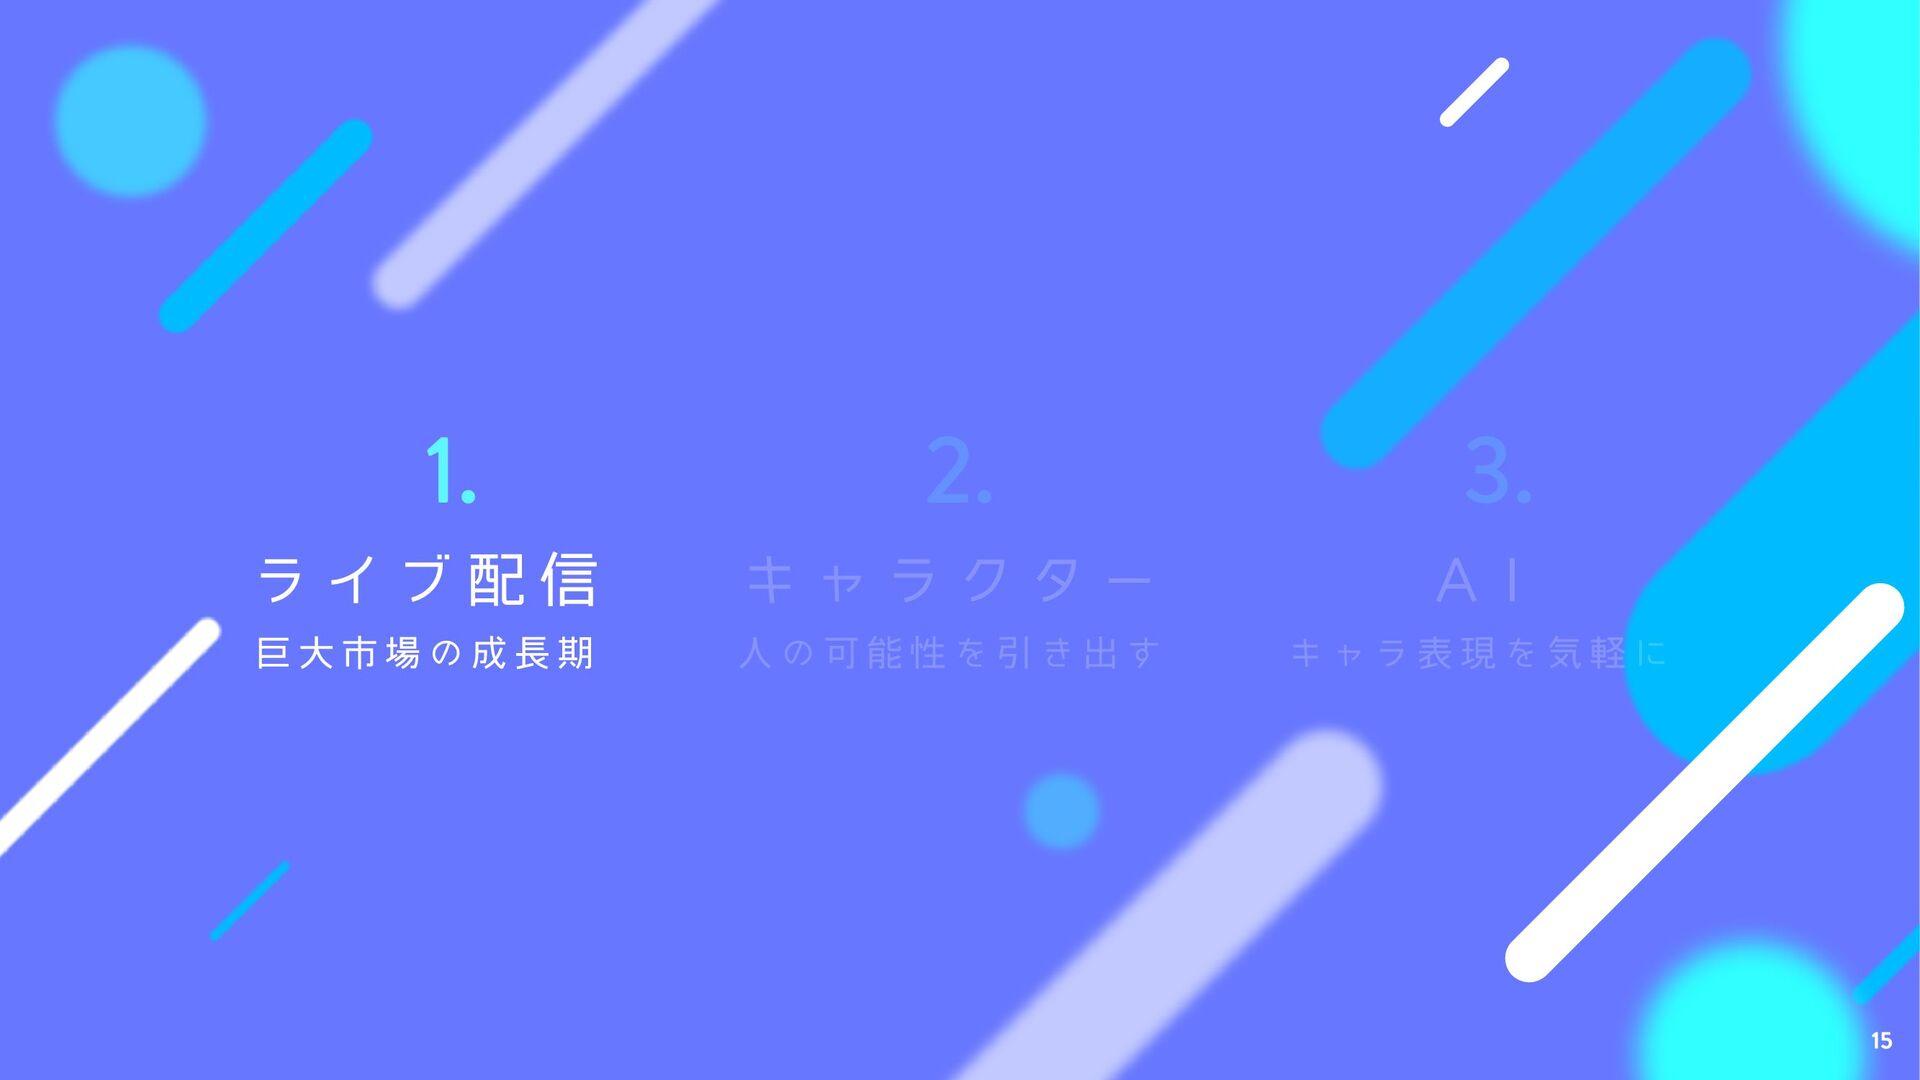 I R I A M の特徴 15 I R I A M ライブ配信  巨大市場の成長期 1. キ...